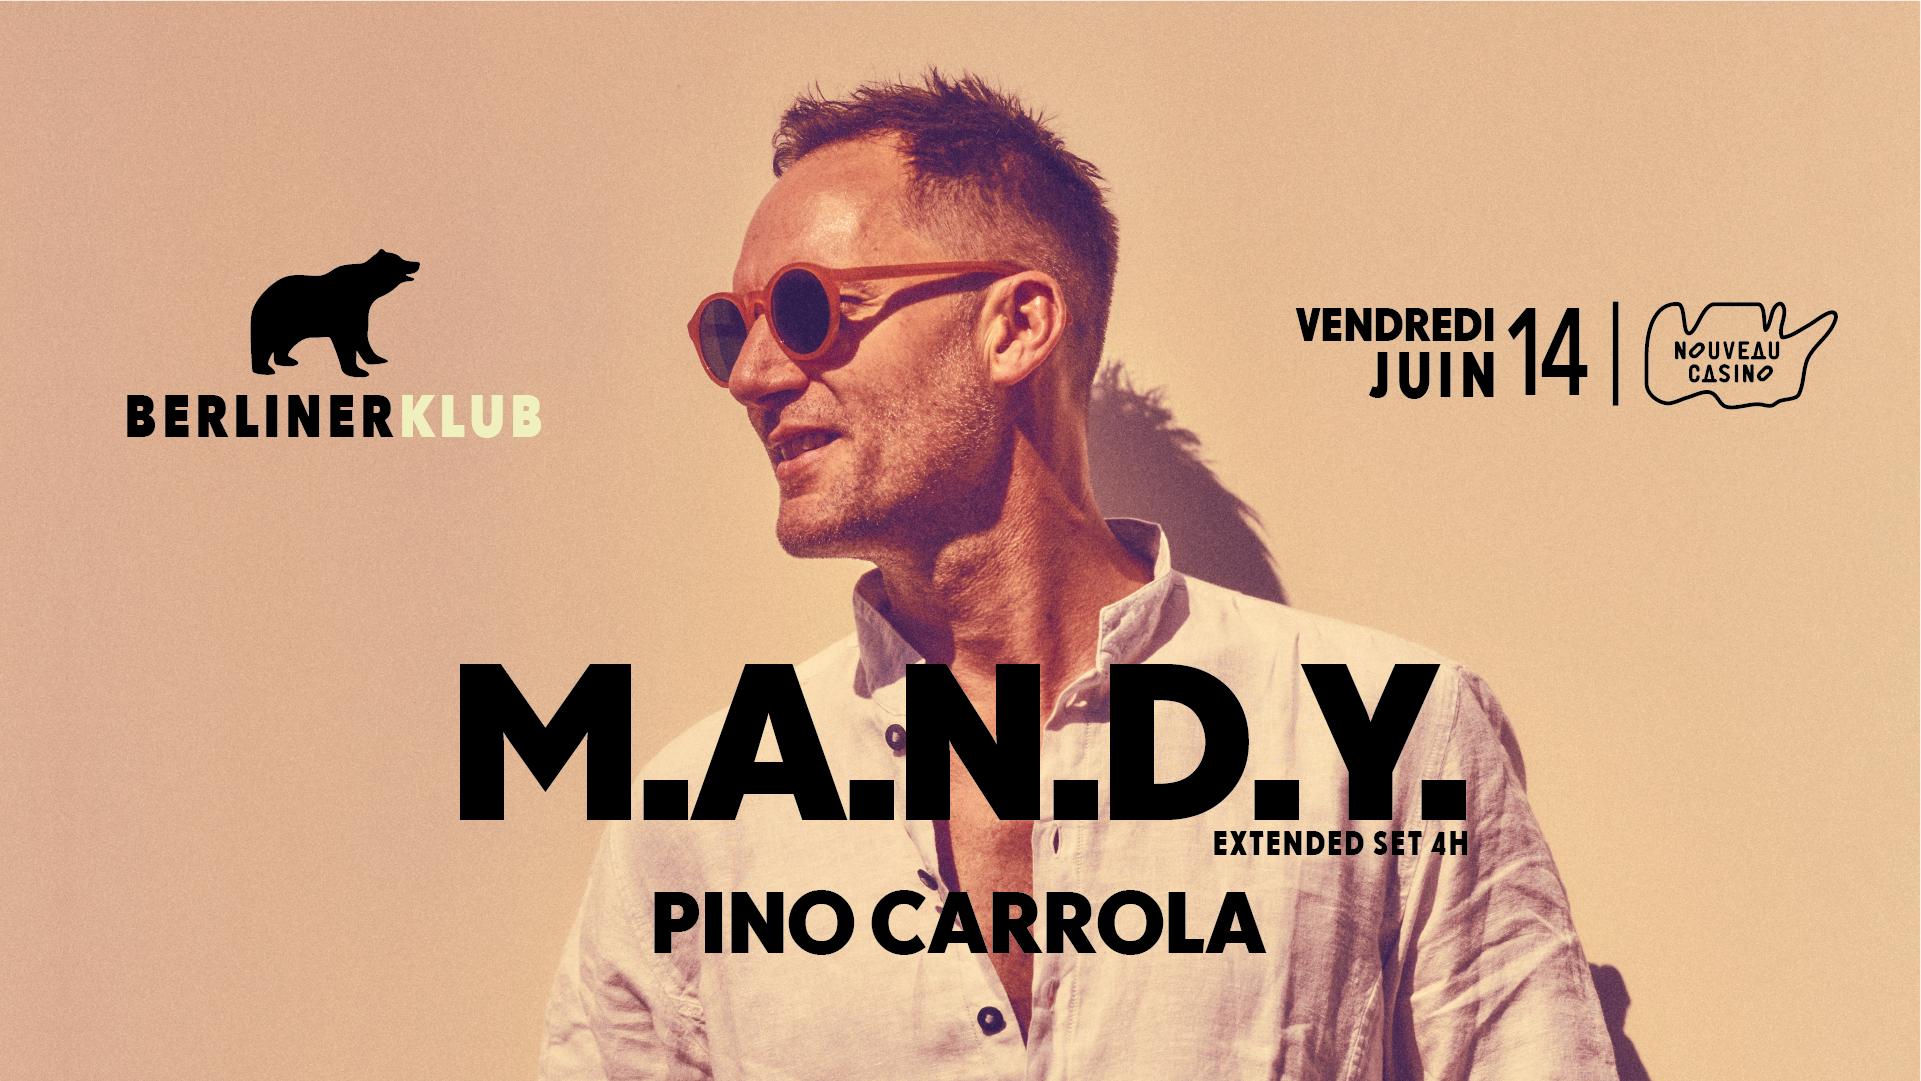 Berliner Klub : MANDY (Extended Set), Pino Carrola